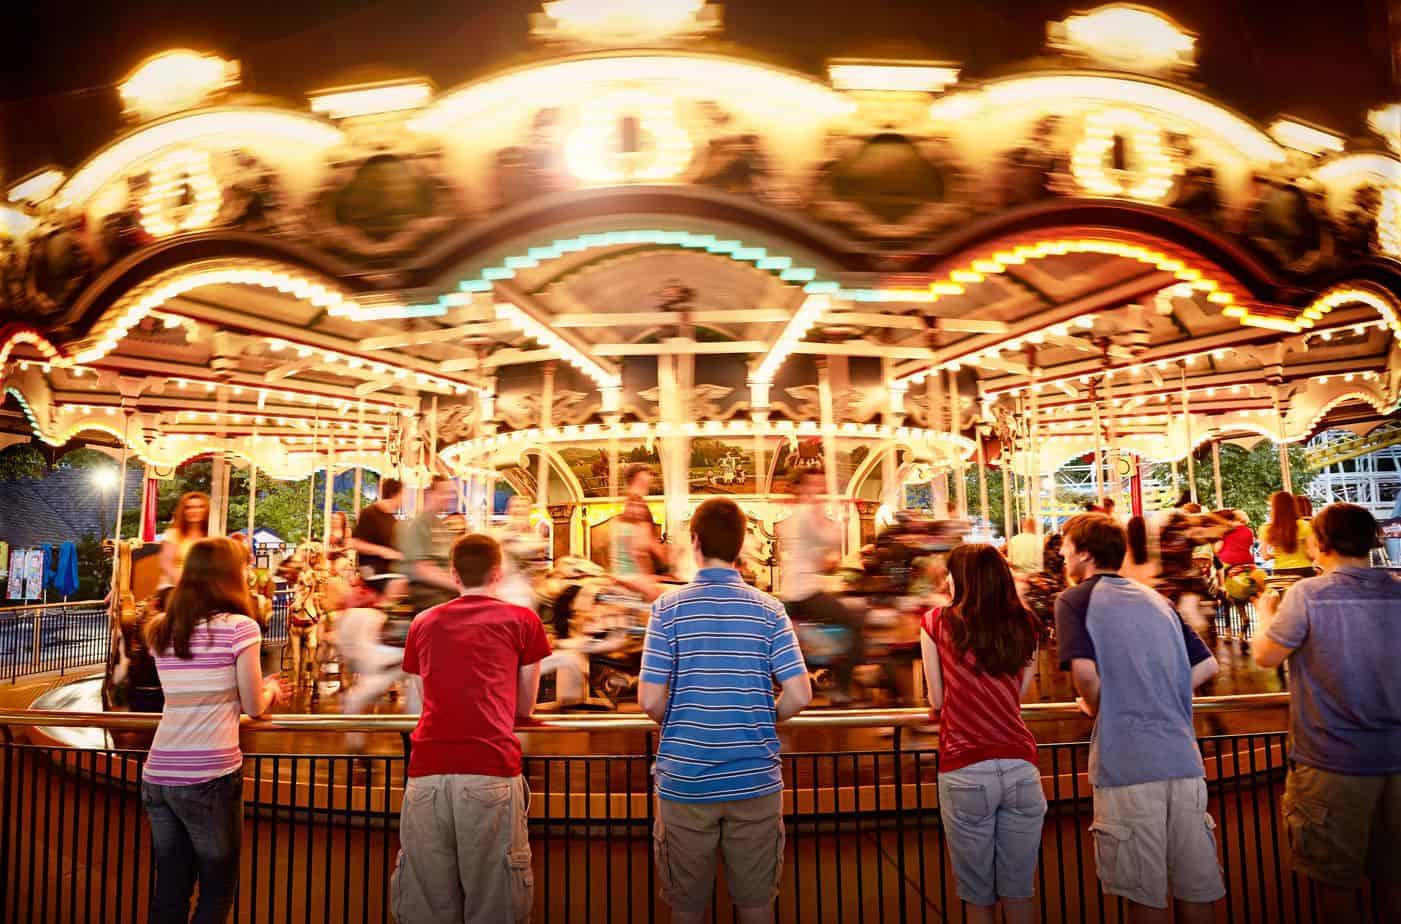 hersheypark carousel at night